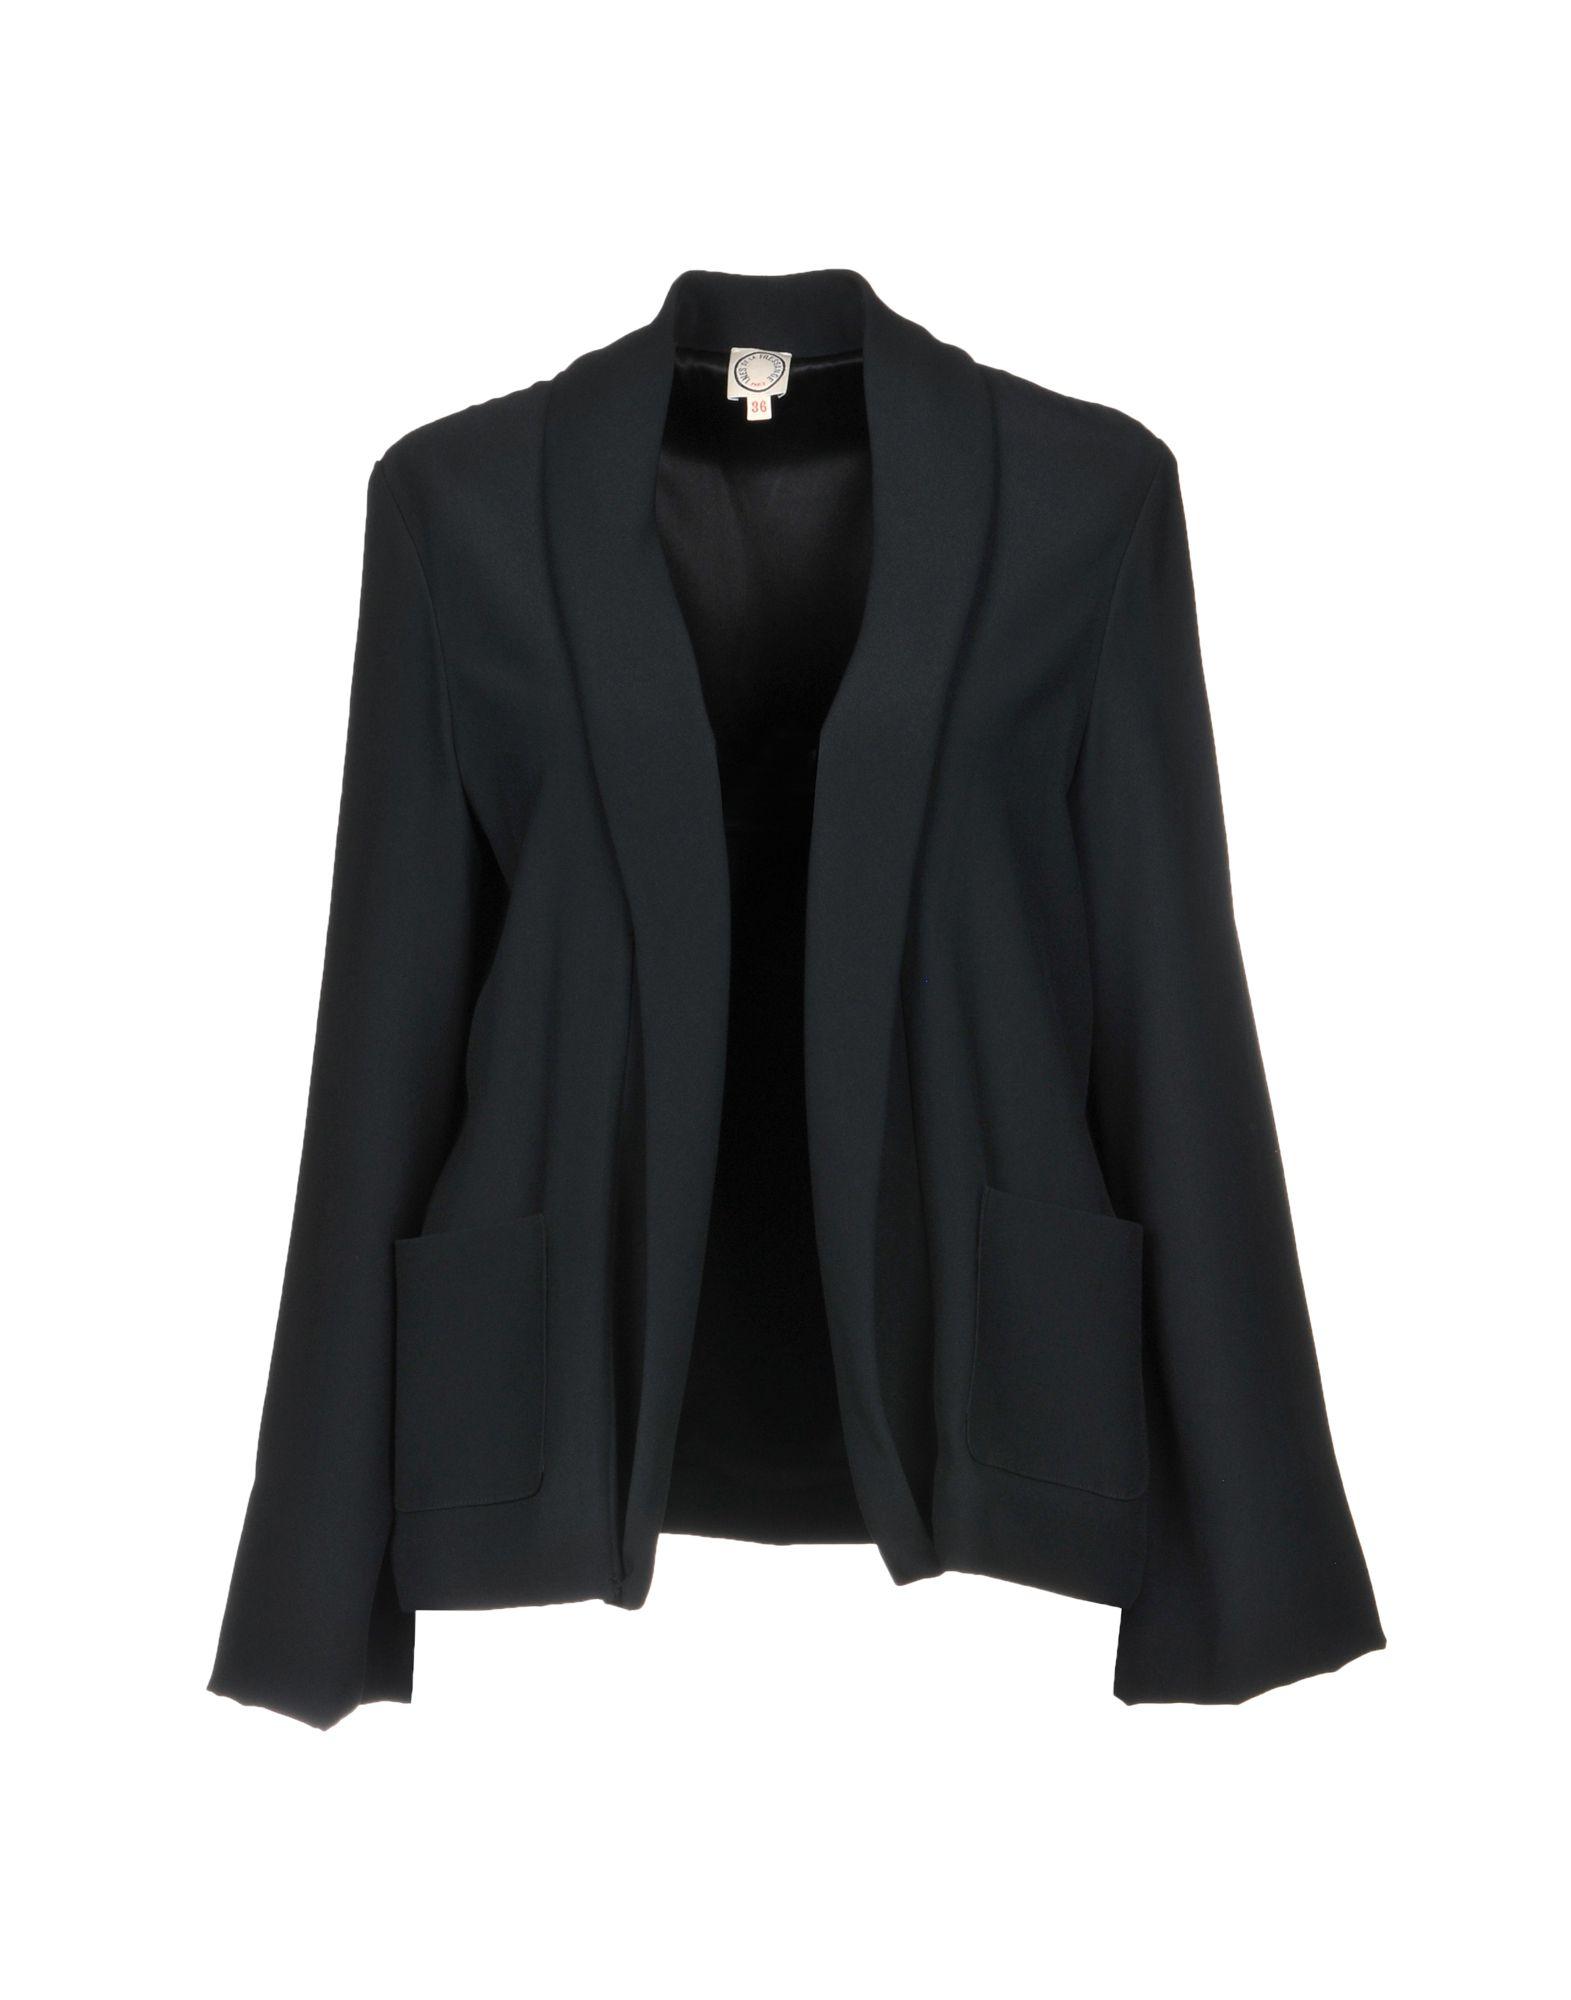 INES DE LA FRESSANGE Blazer in Black